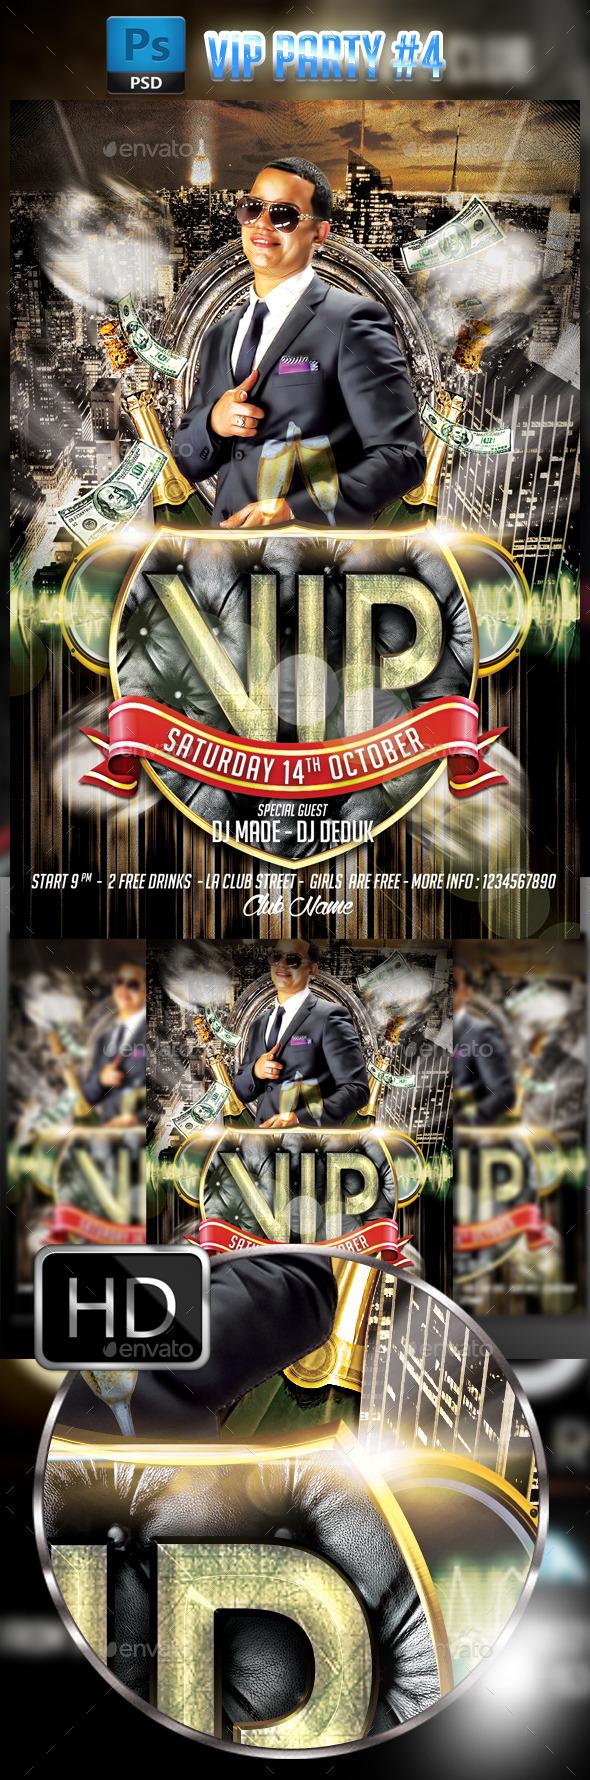 GraphicRiver VIP Party #4 9009506